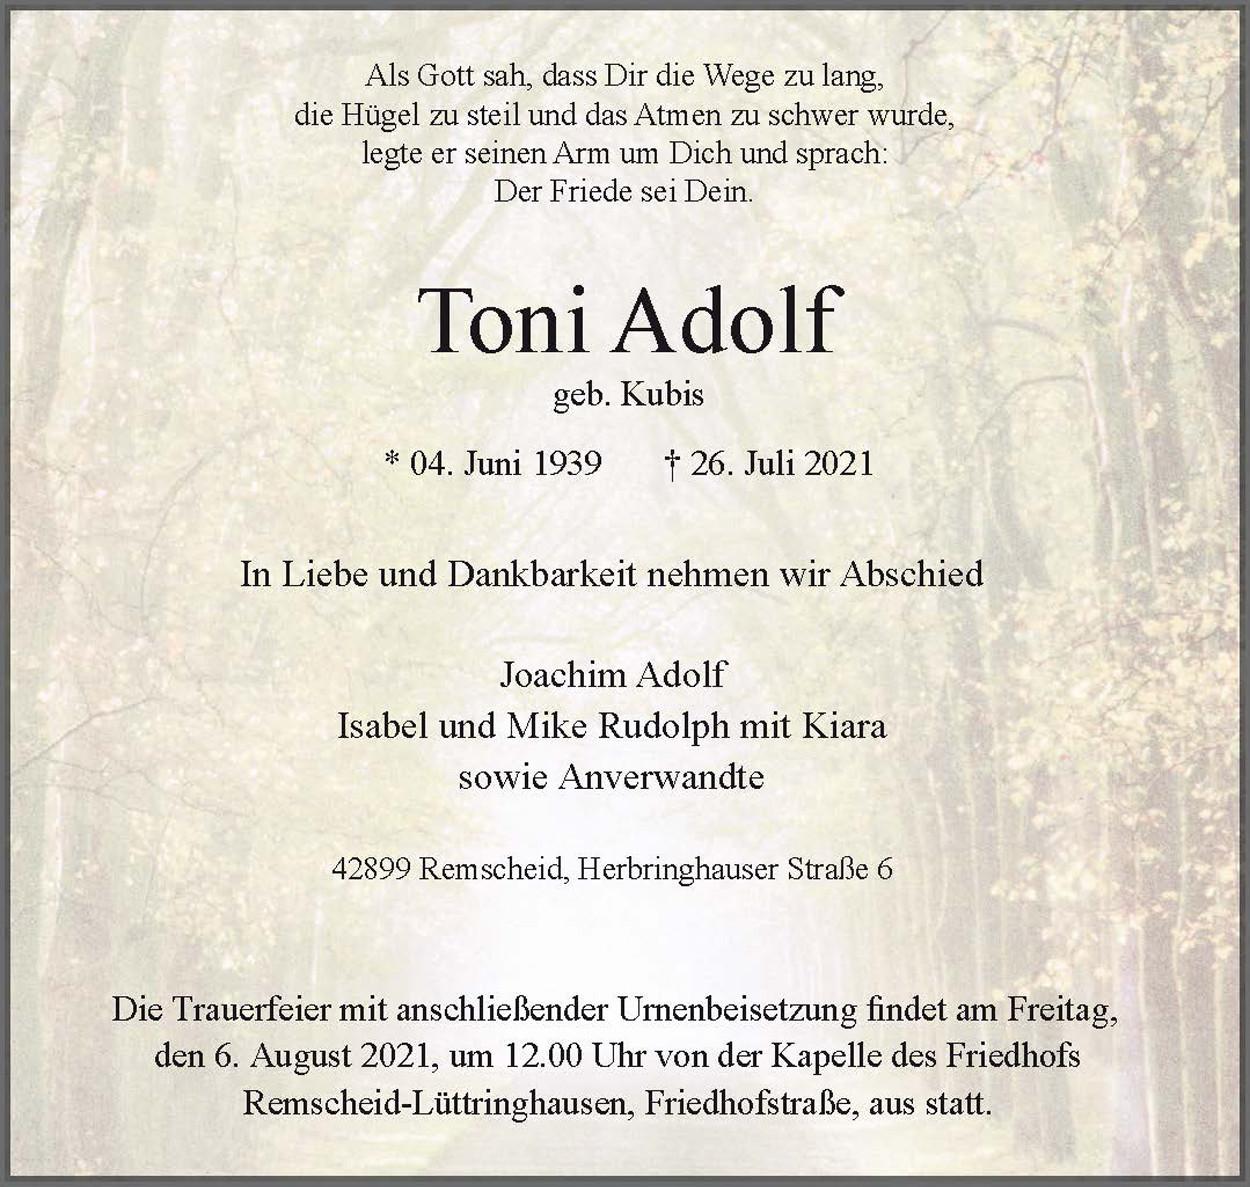 Toni Adolf